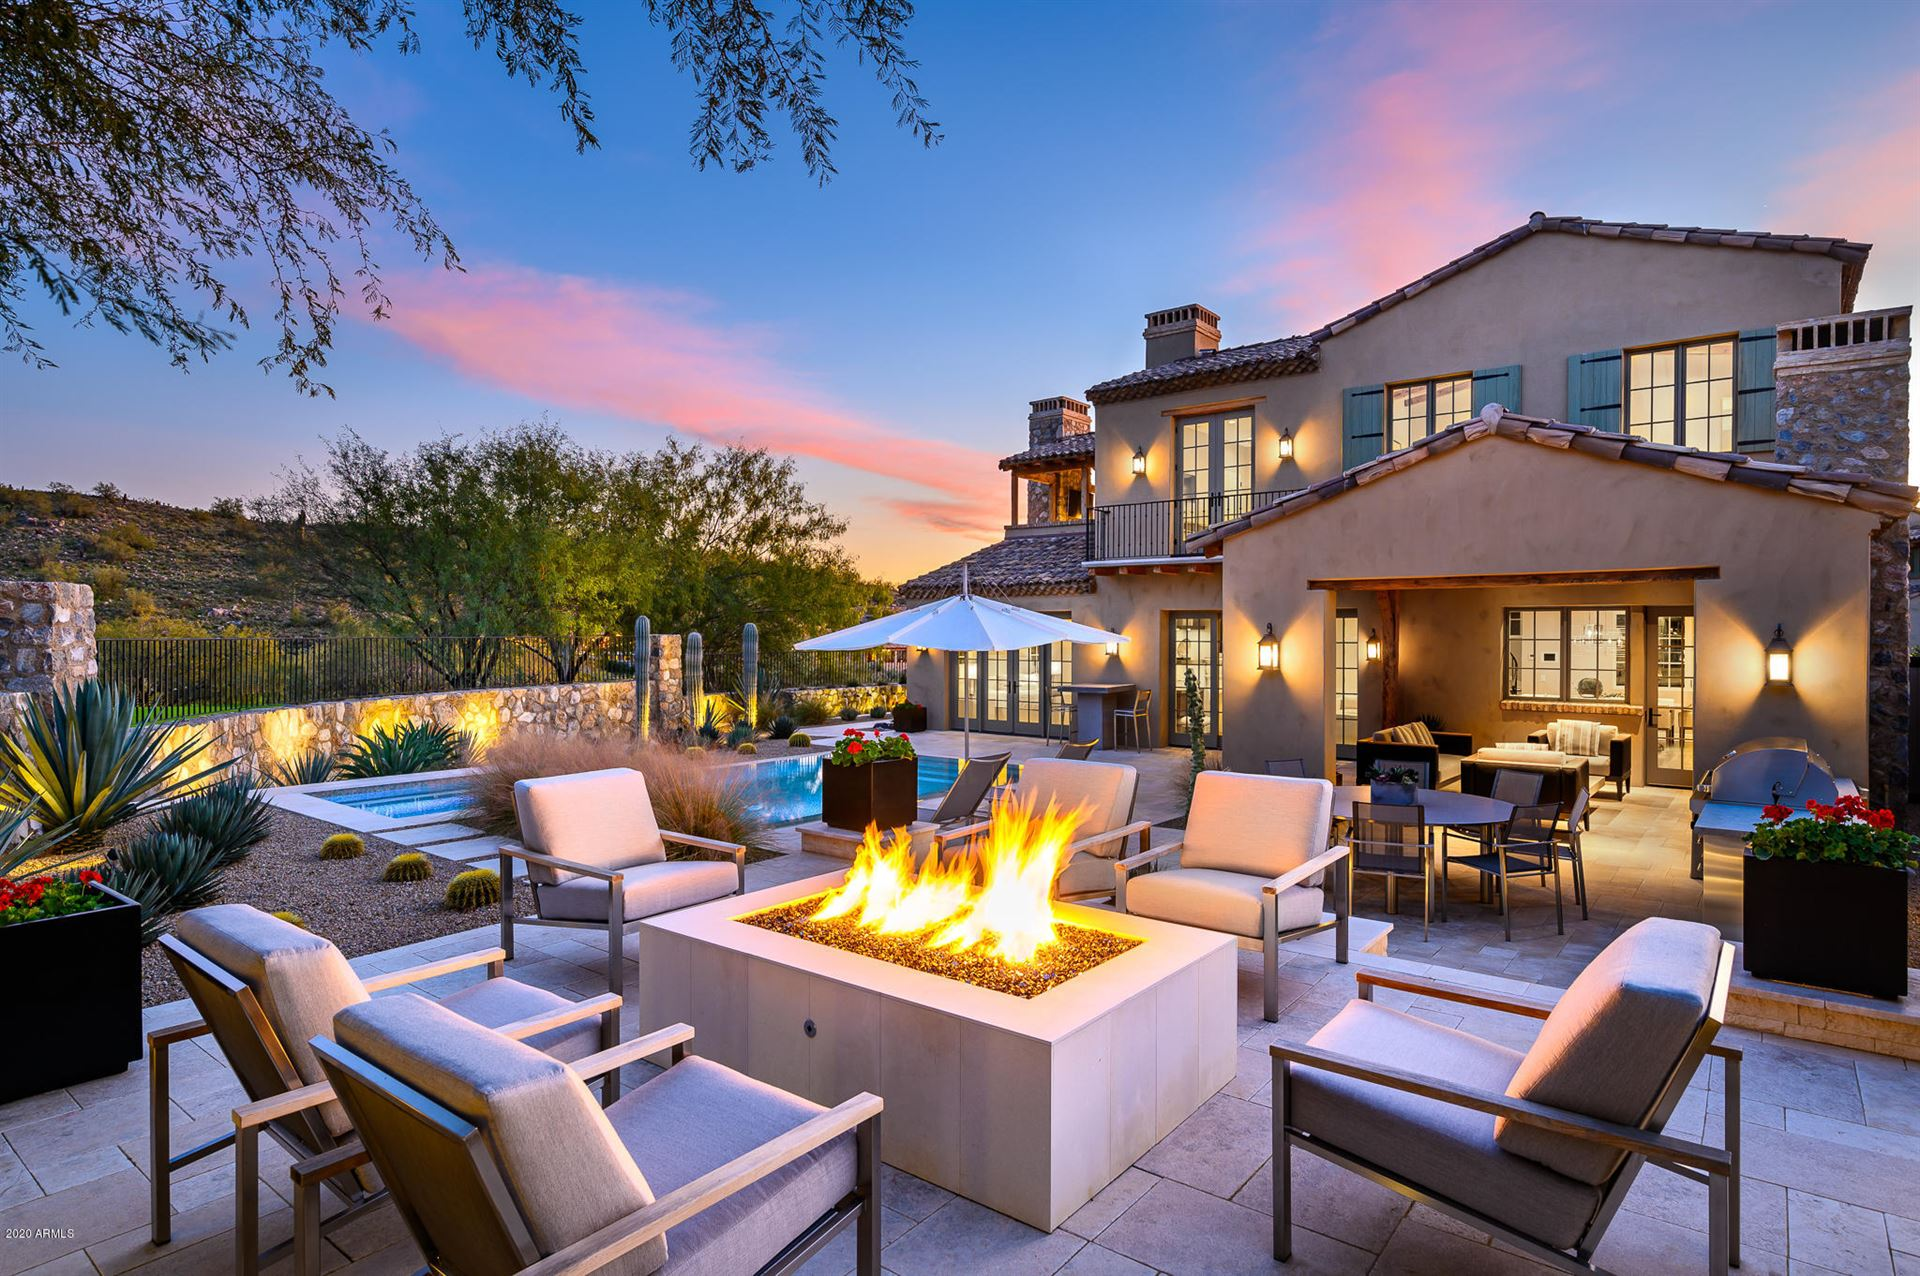 Photo of 18903 N SILVERLEAF Drive, Scottsdale, AZ 85255 (MLS # 6208210)